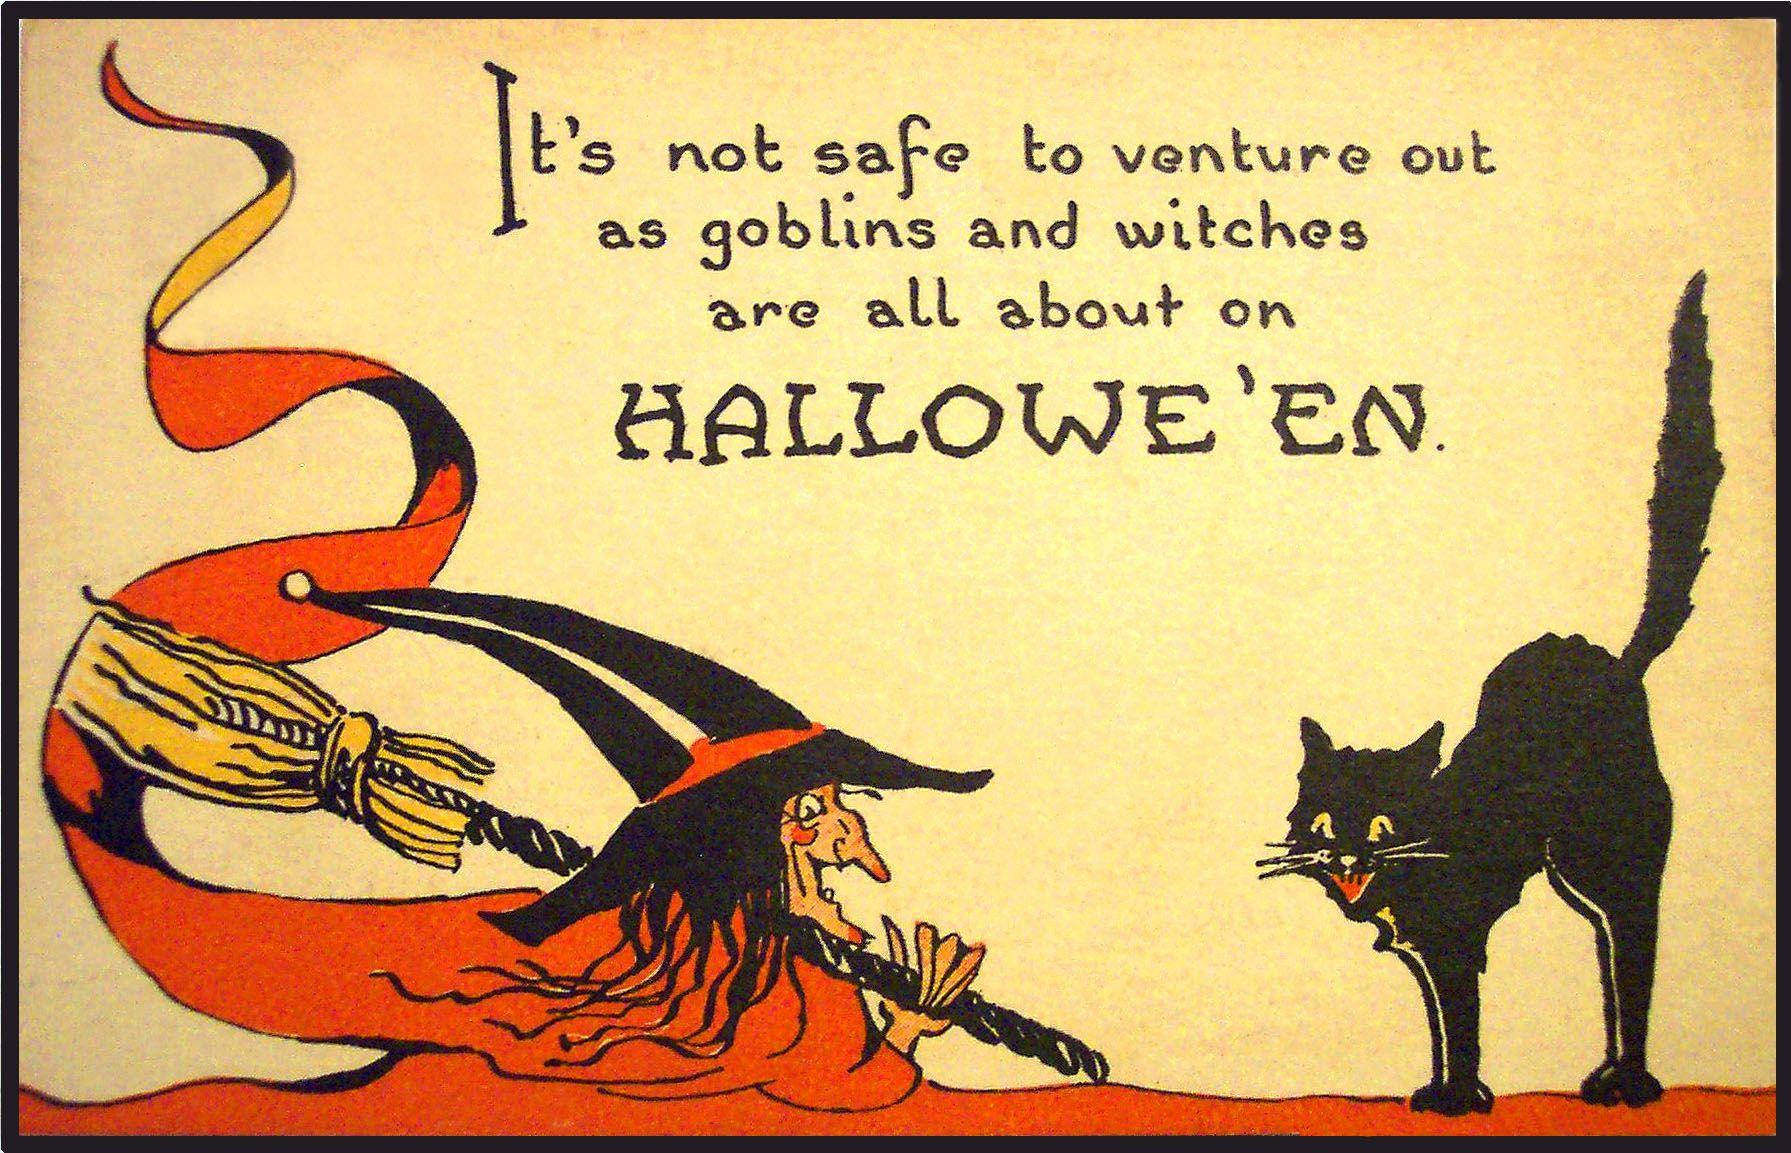 Diy halloween door decorations homemade halloween cards cool diy halloween door decorations homemade halloween cards cool greeting card ideas for diy greeting kristyandbryce Images